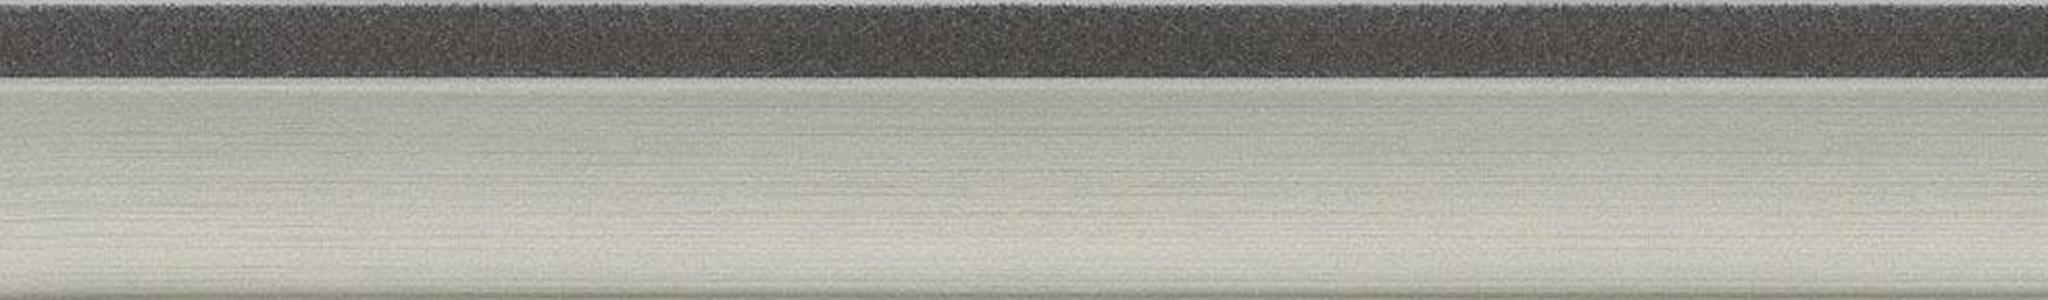 HD 29710 Acryl 3D Edge Steel-Anthracite